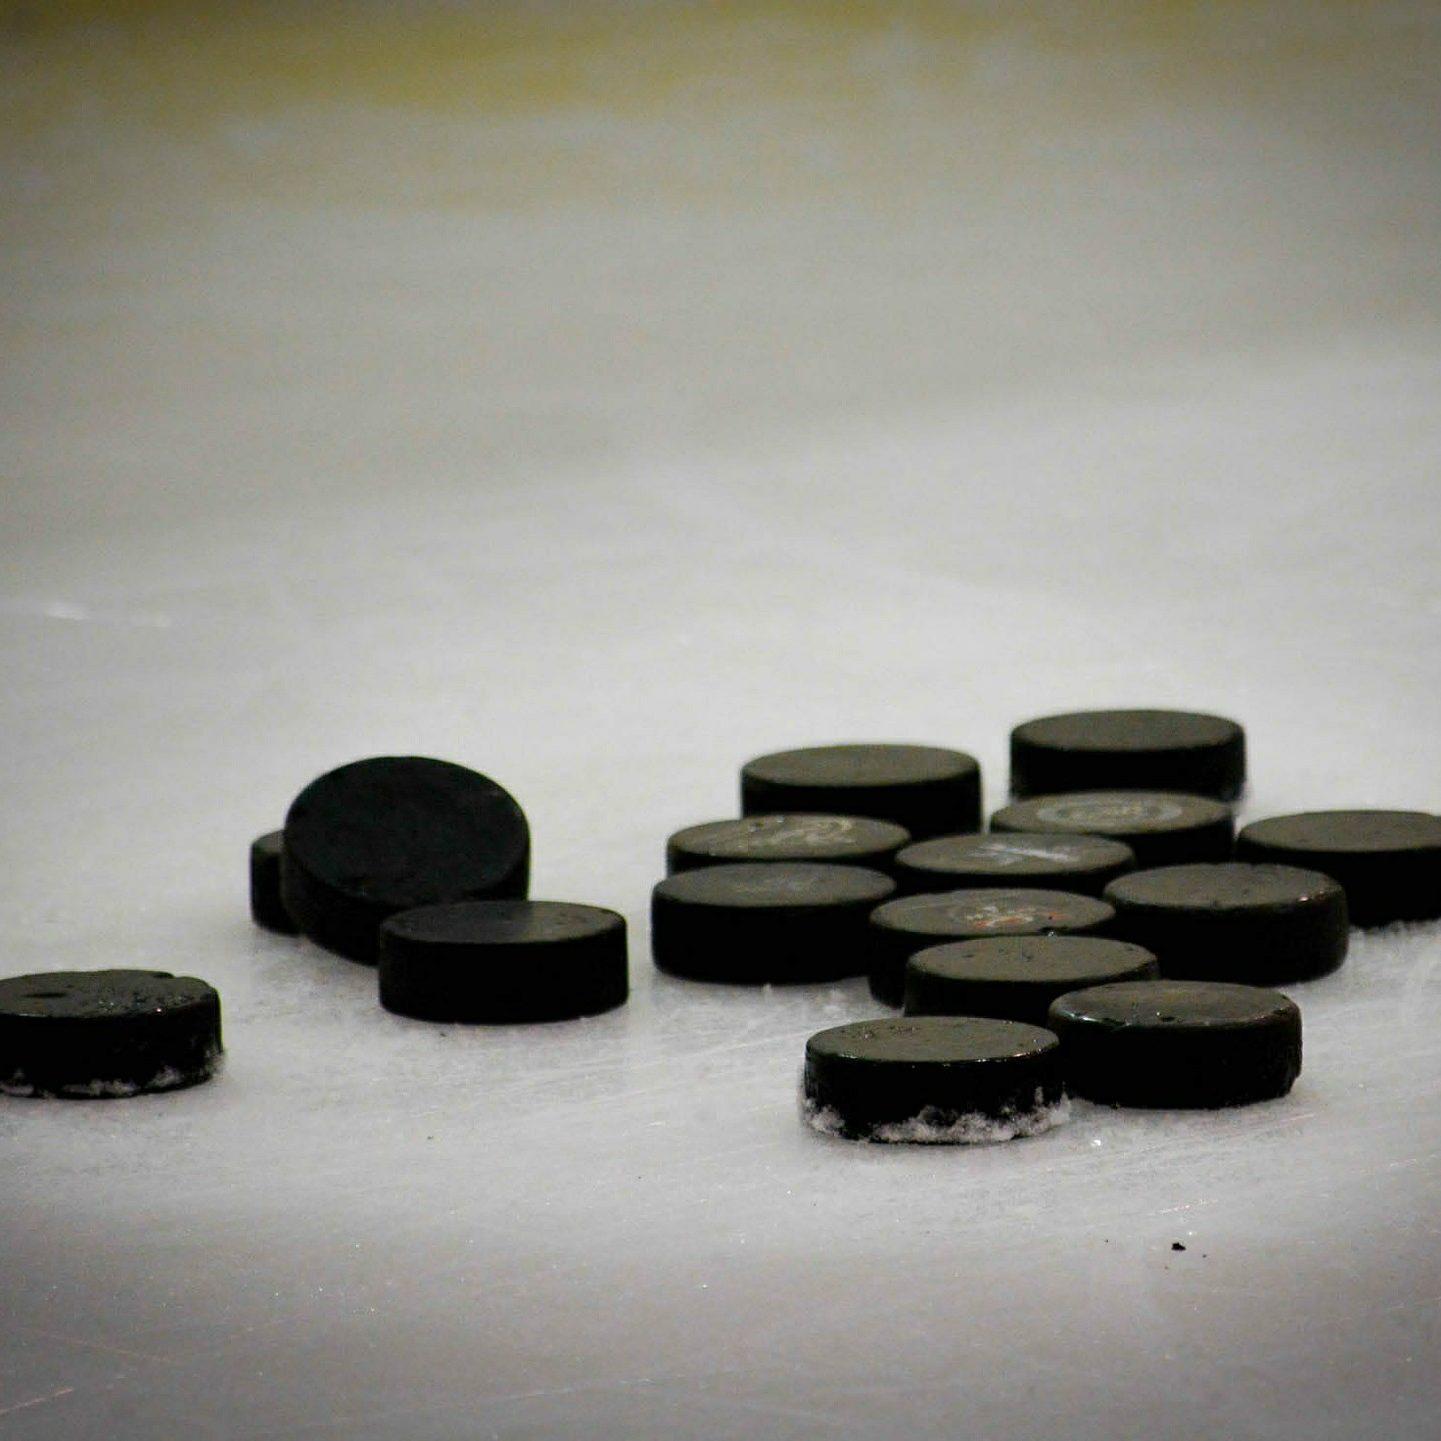 hockey-puck-608582_1920